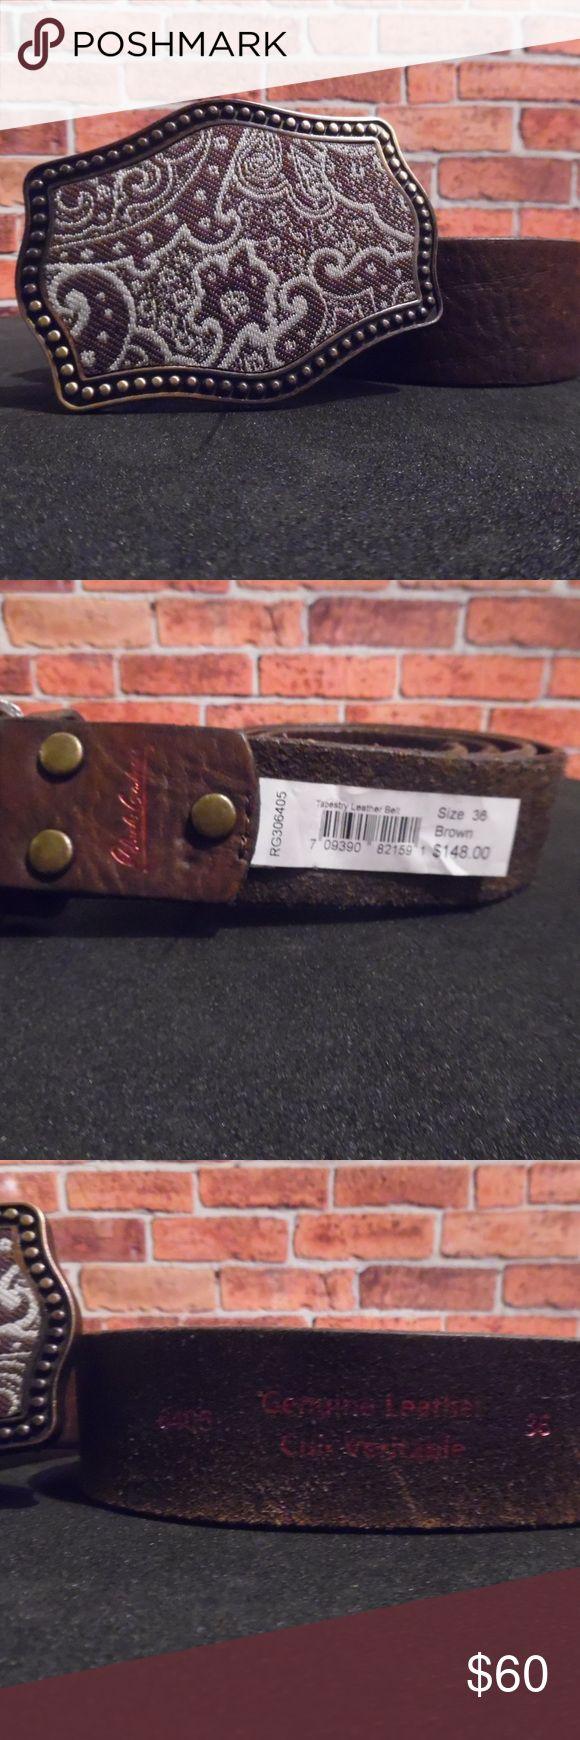 Robert Graham belt with tapestry buckle. Brown leather belt with ornate tapestry buckle by Robert Graham. Robert Graham Accessories Belts